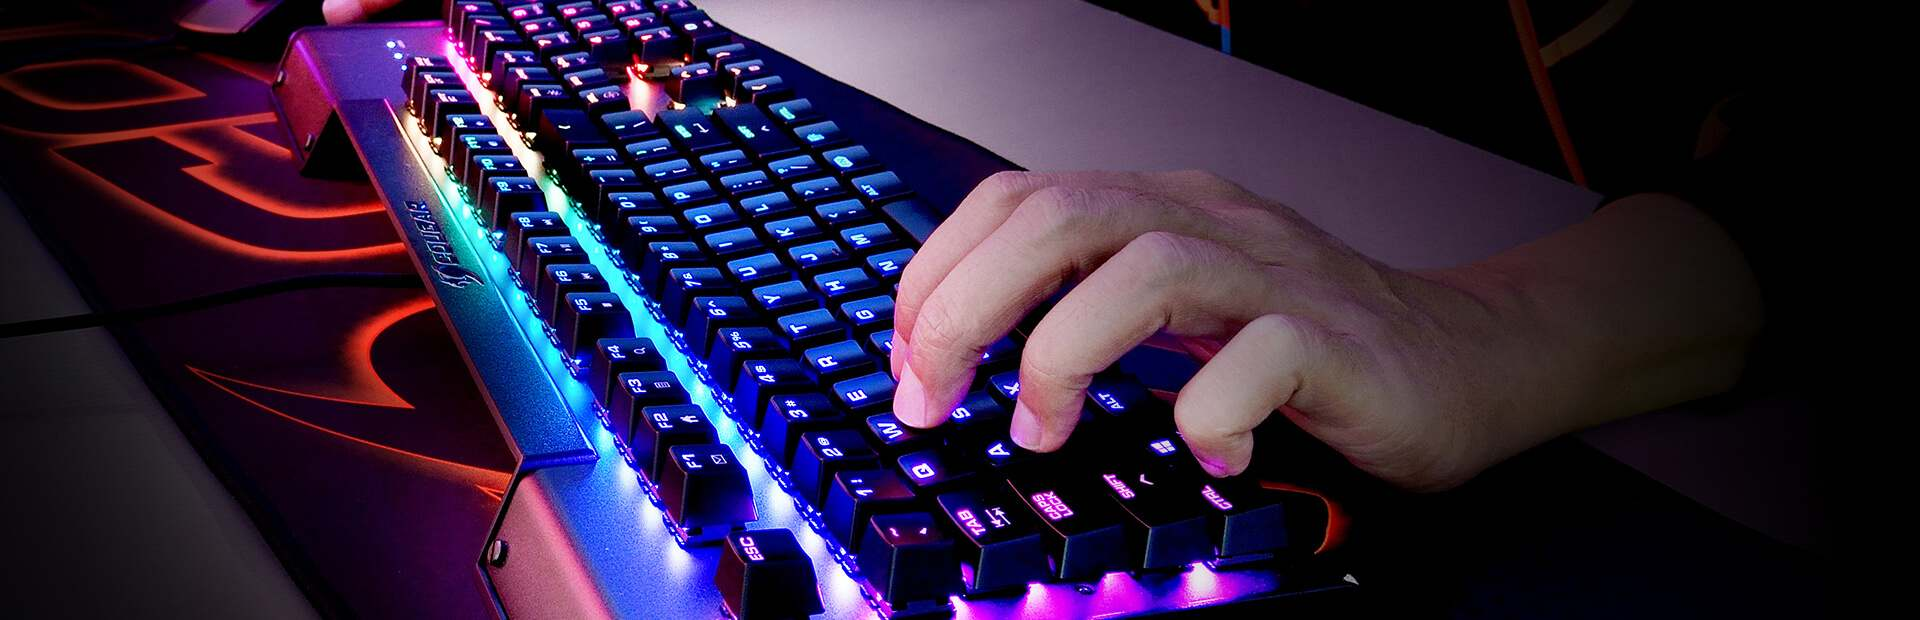 Cougar ULTIMUS RGB3 Mechanical Gaming Keyboard Blue Switches